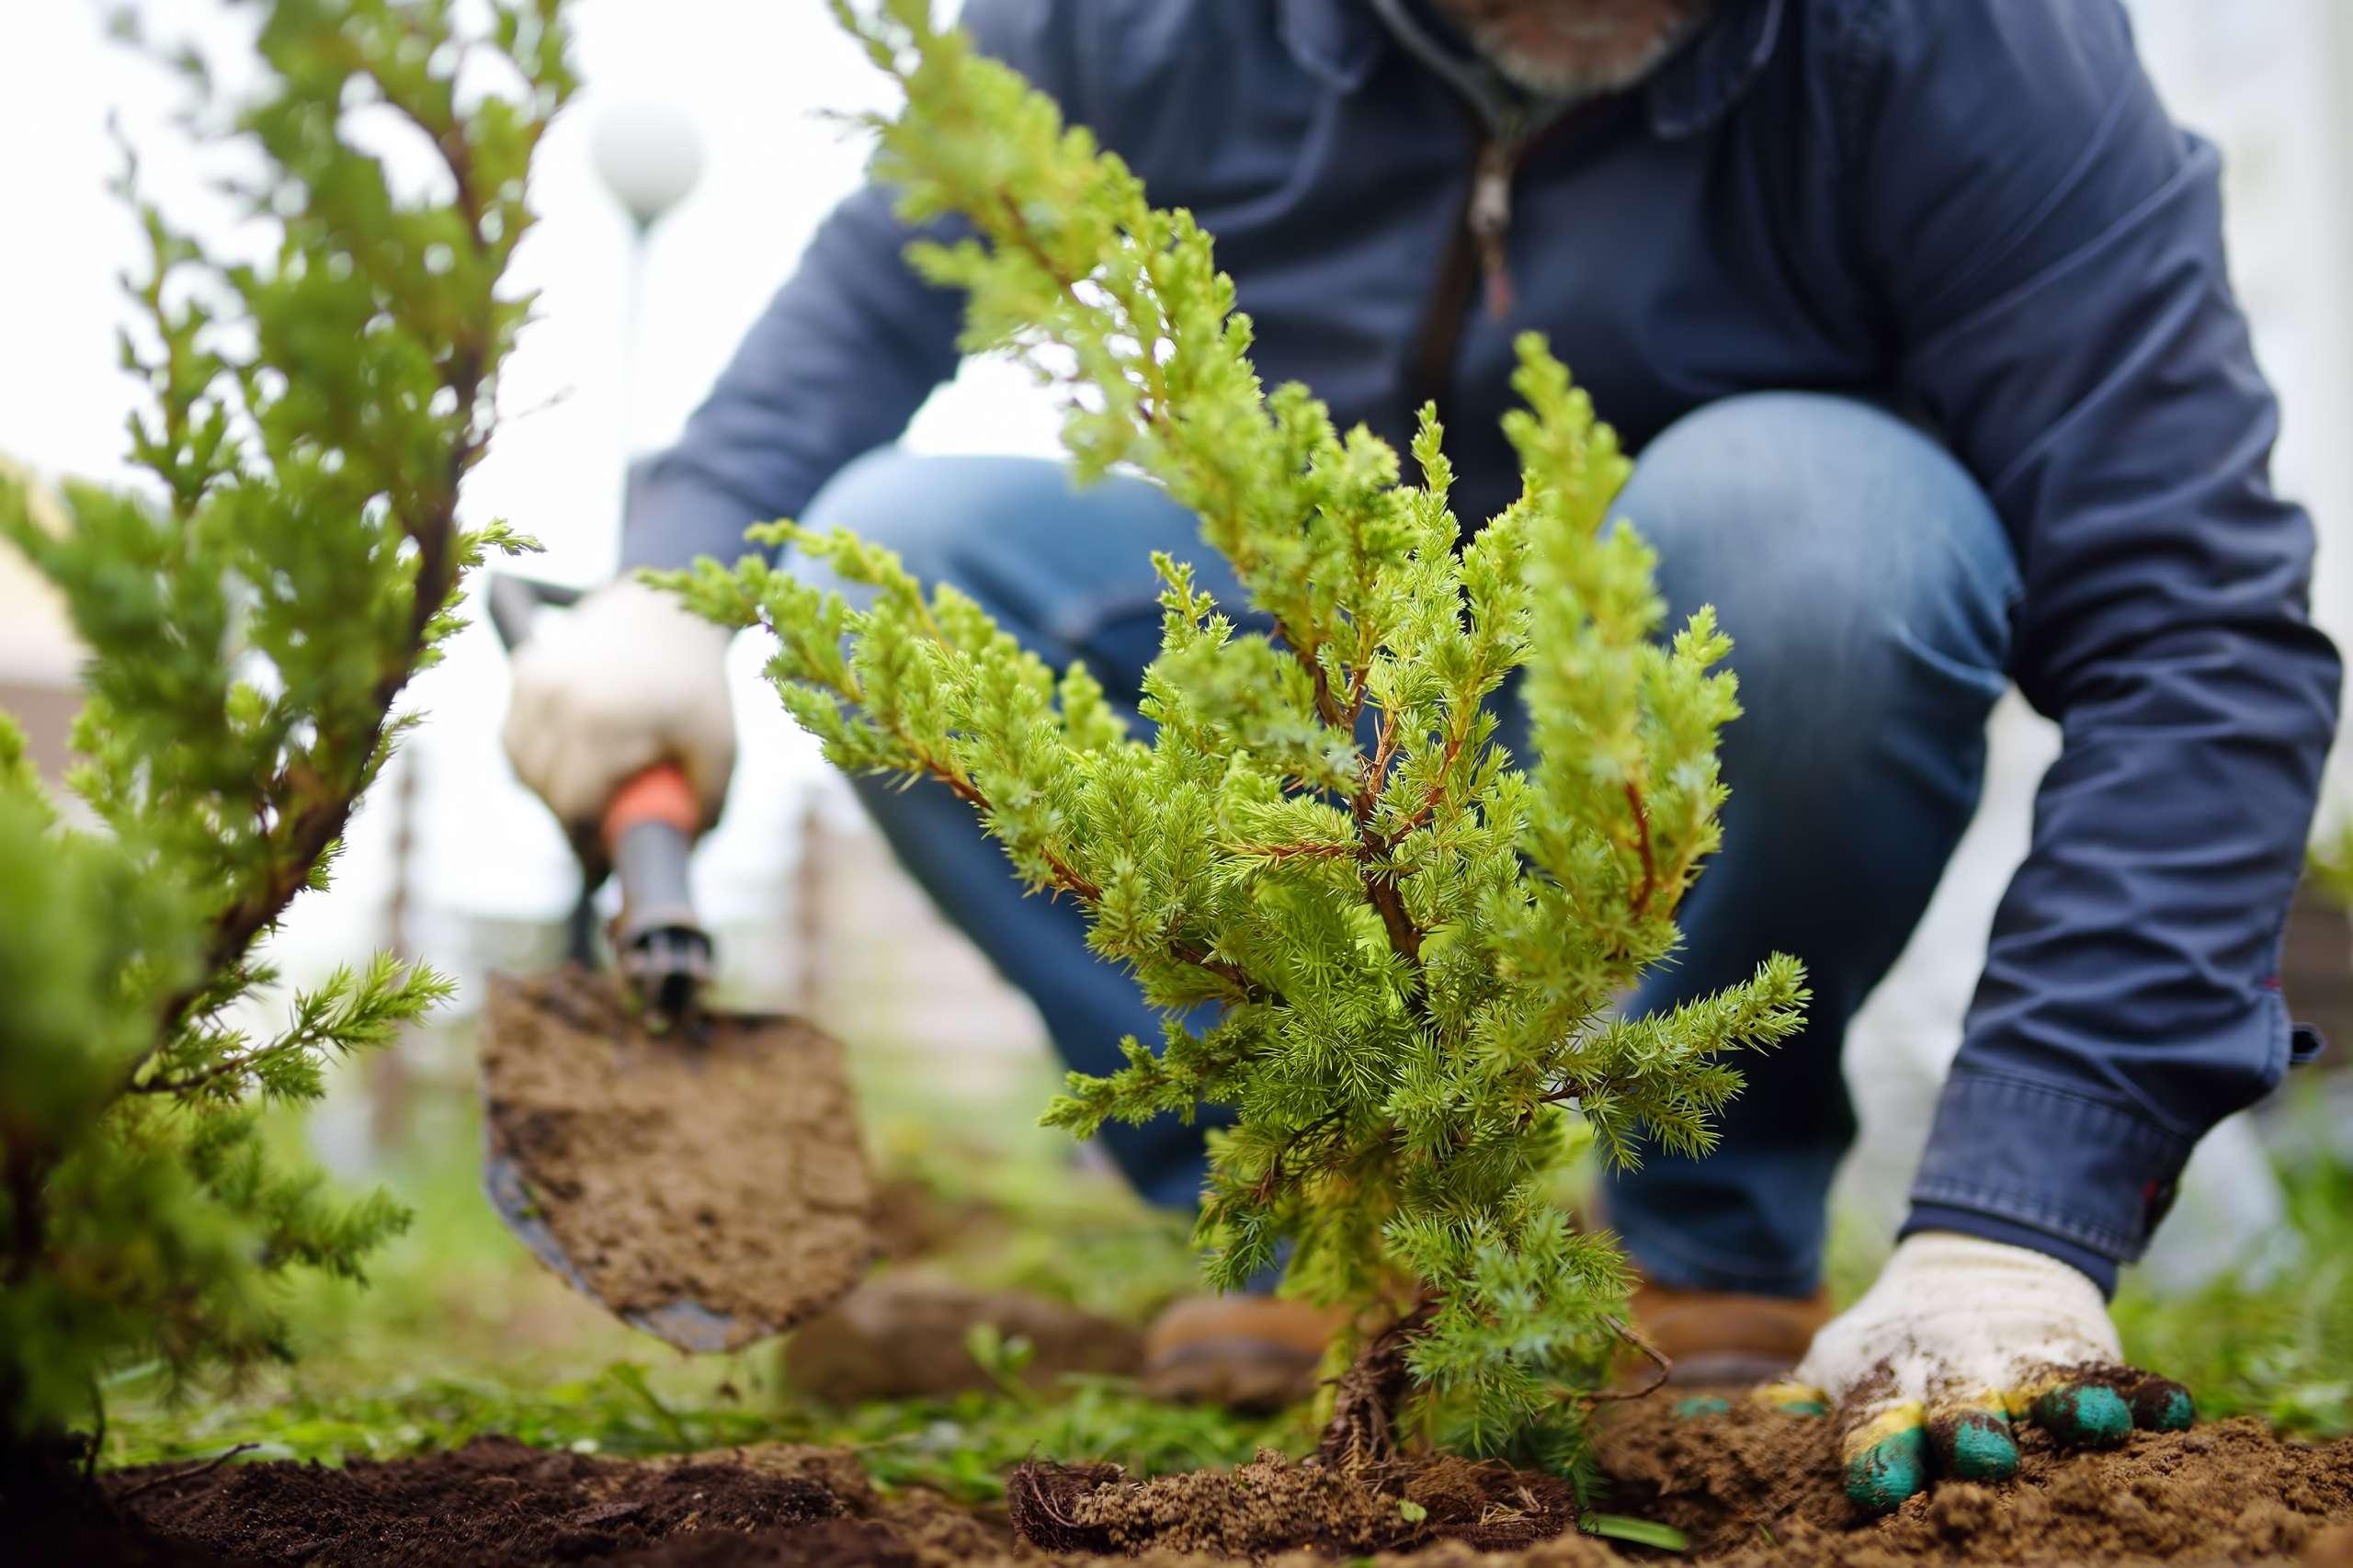 Gardener planting juniper plants in the yard. Seasonal works in the garden